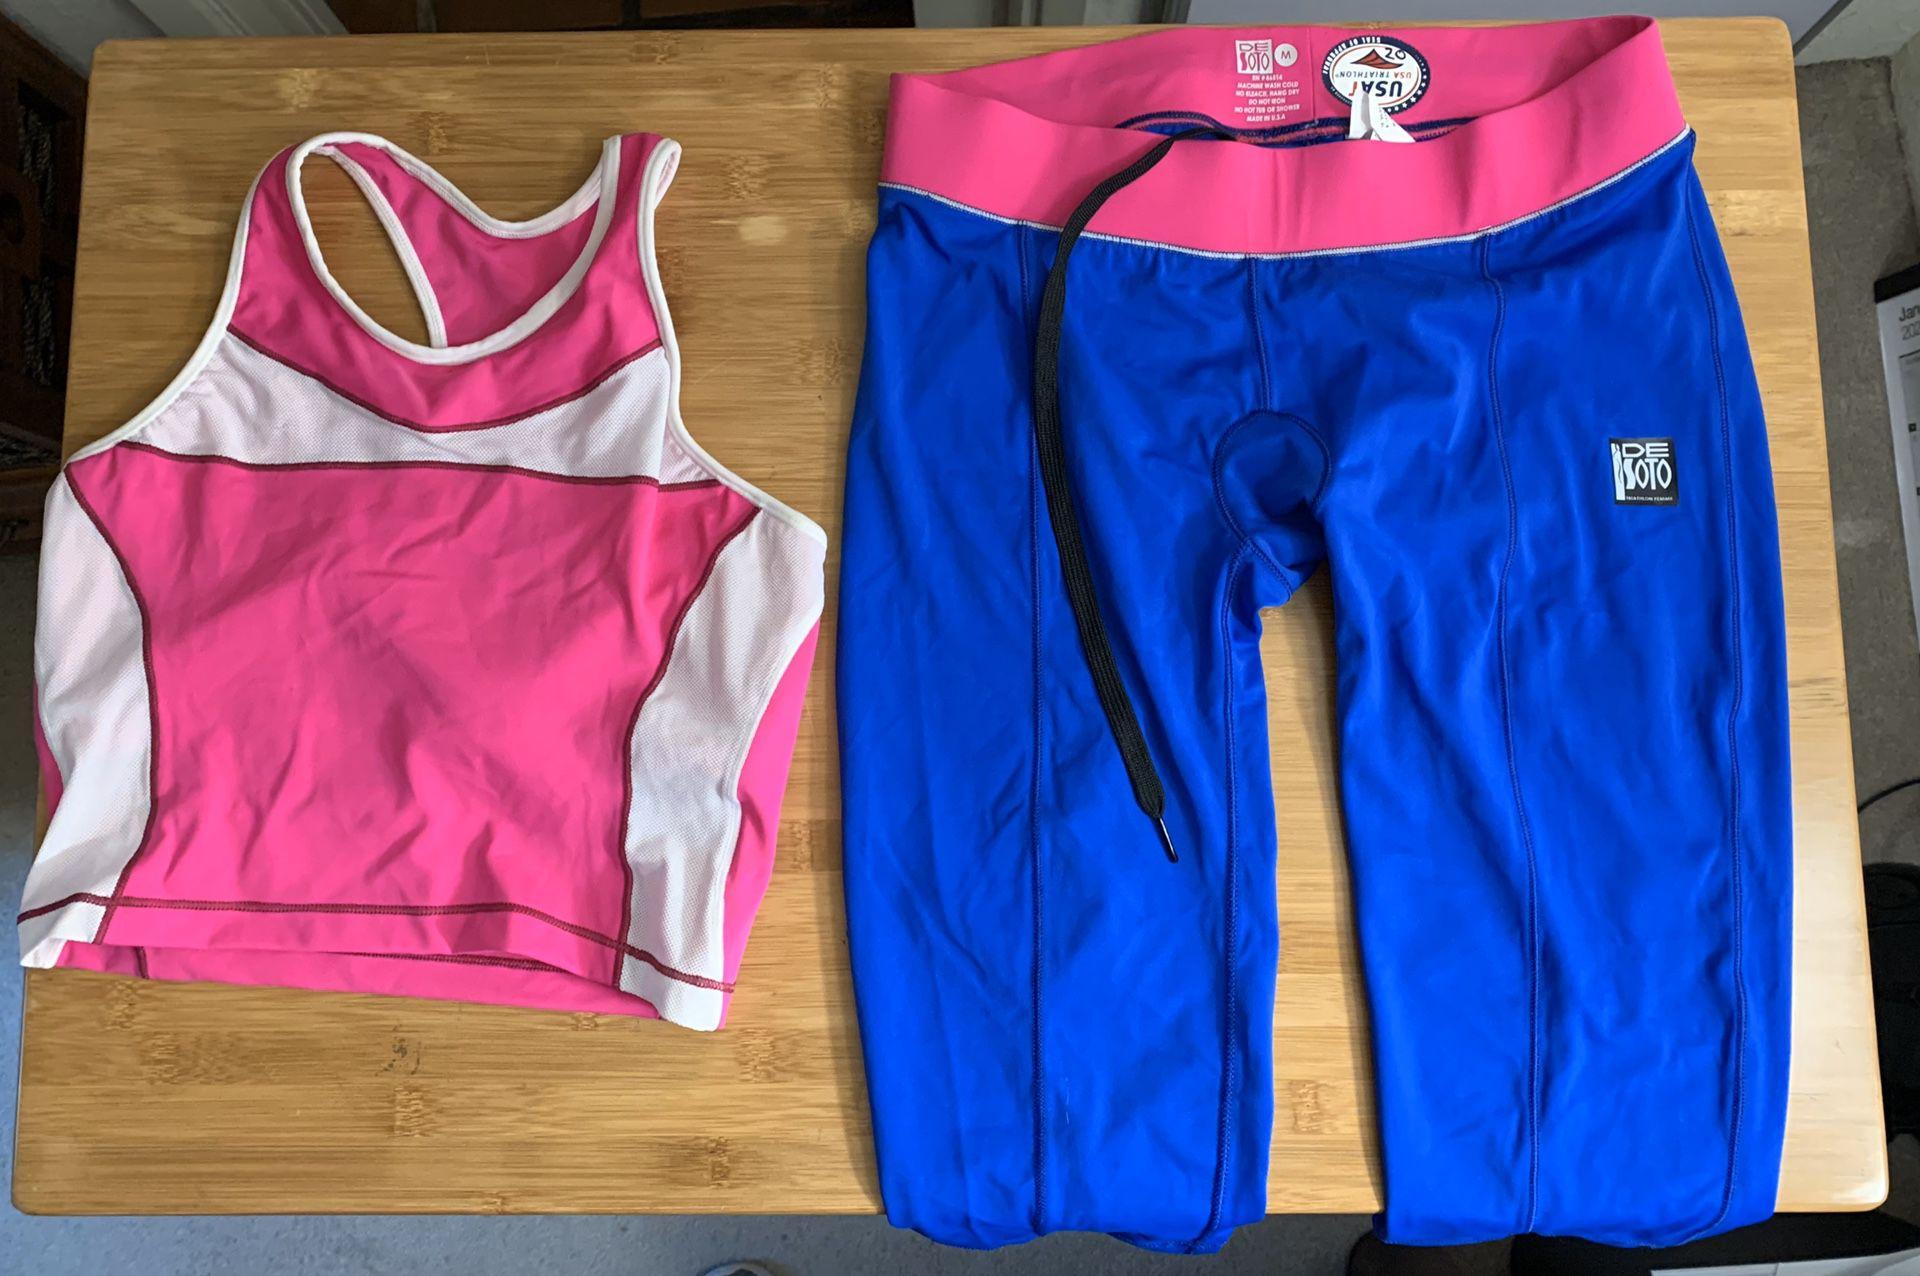 De Soto Sport Women's Triathlon Top and Bottom Medium Never Worn